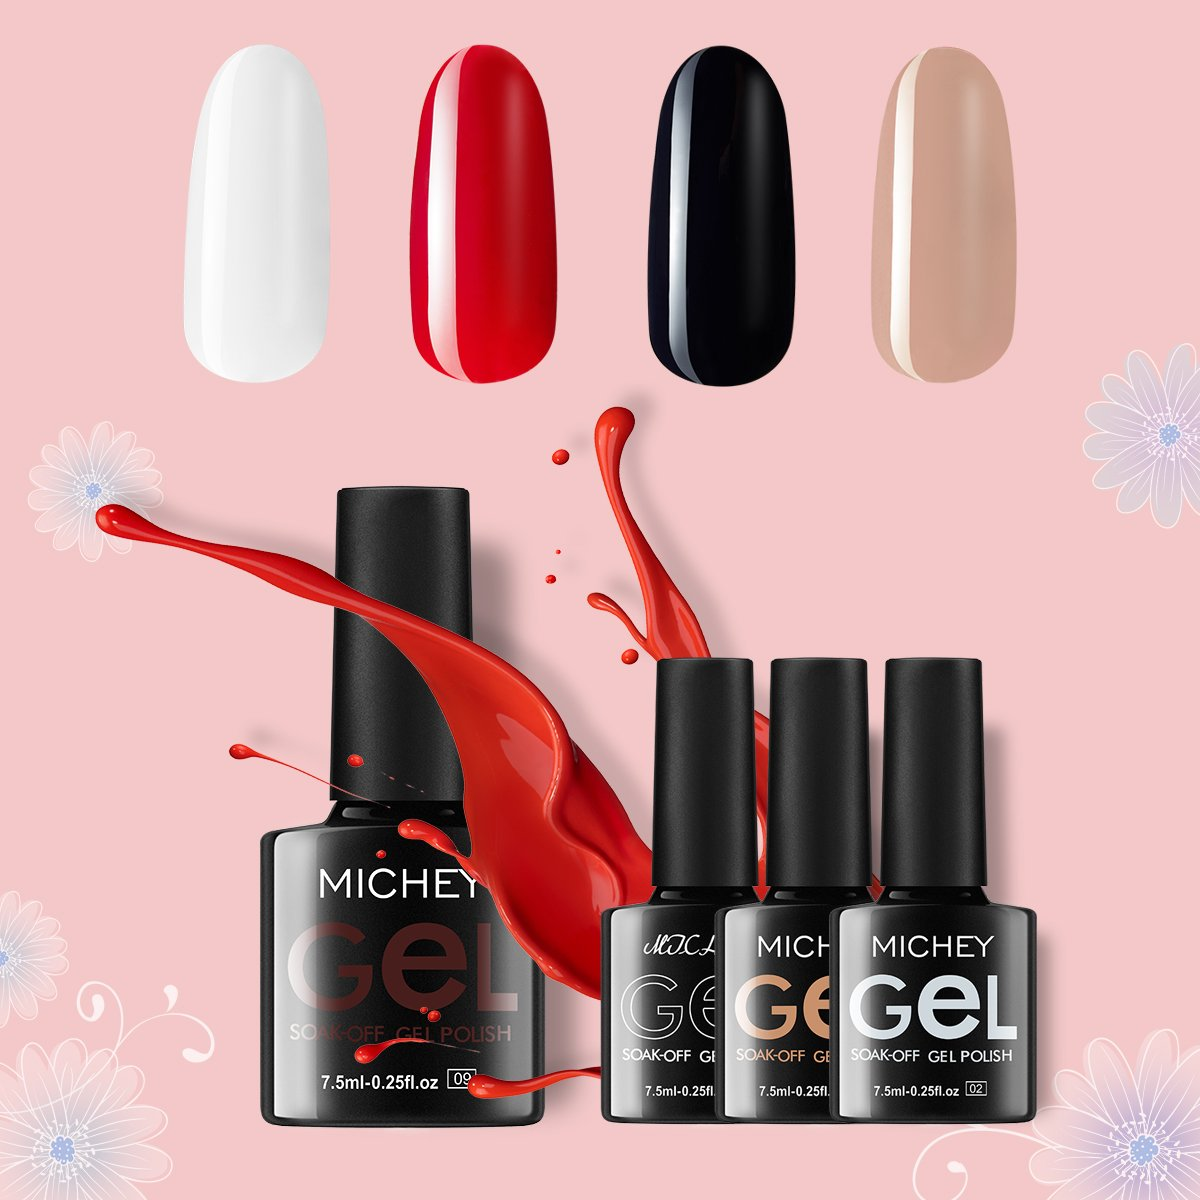 Amazon.com: MICHEYGel UV Gel Nail Polish, 4pcs, Super Glossy ...